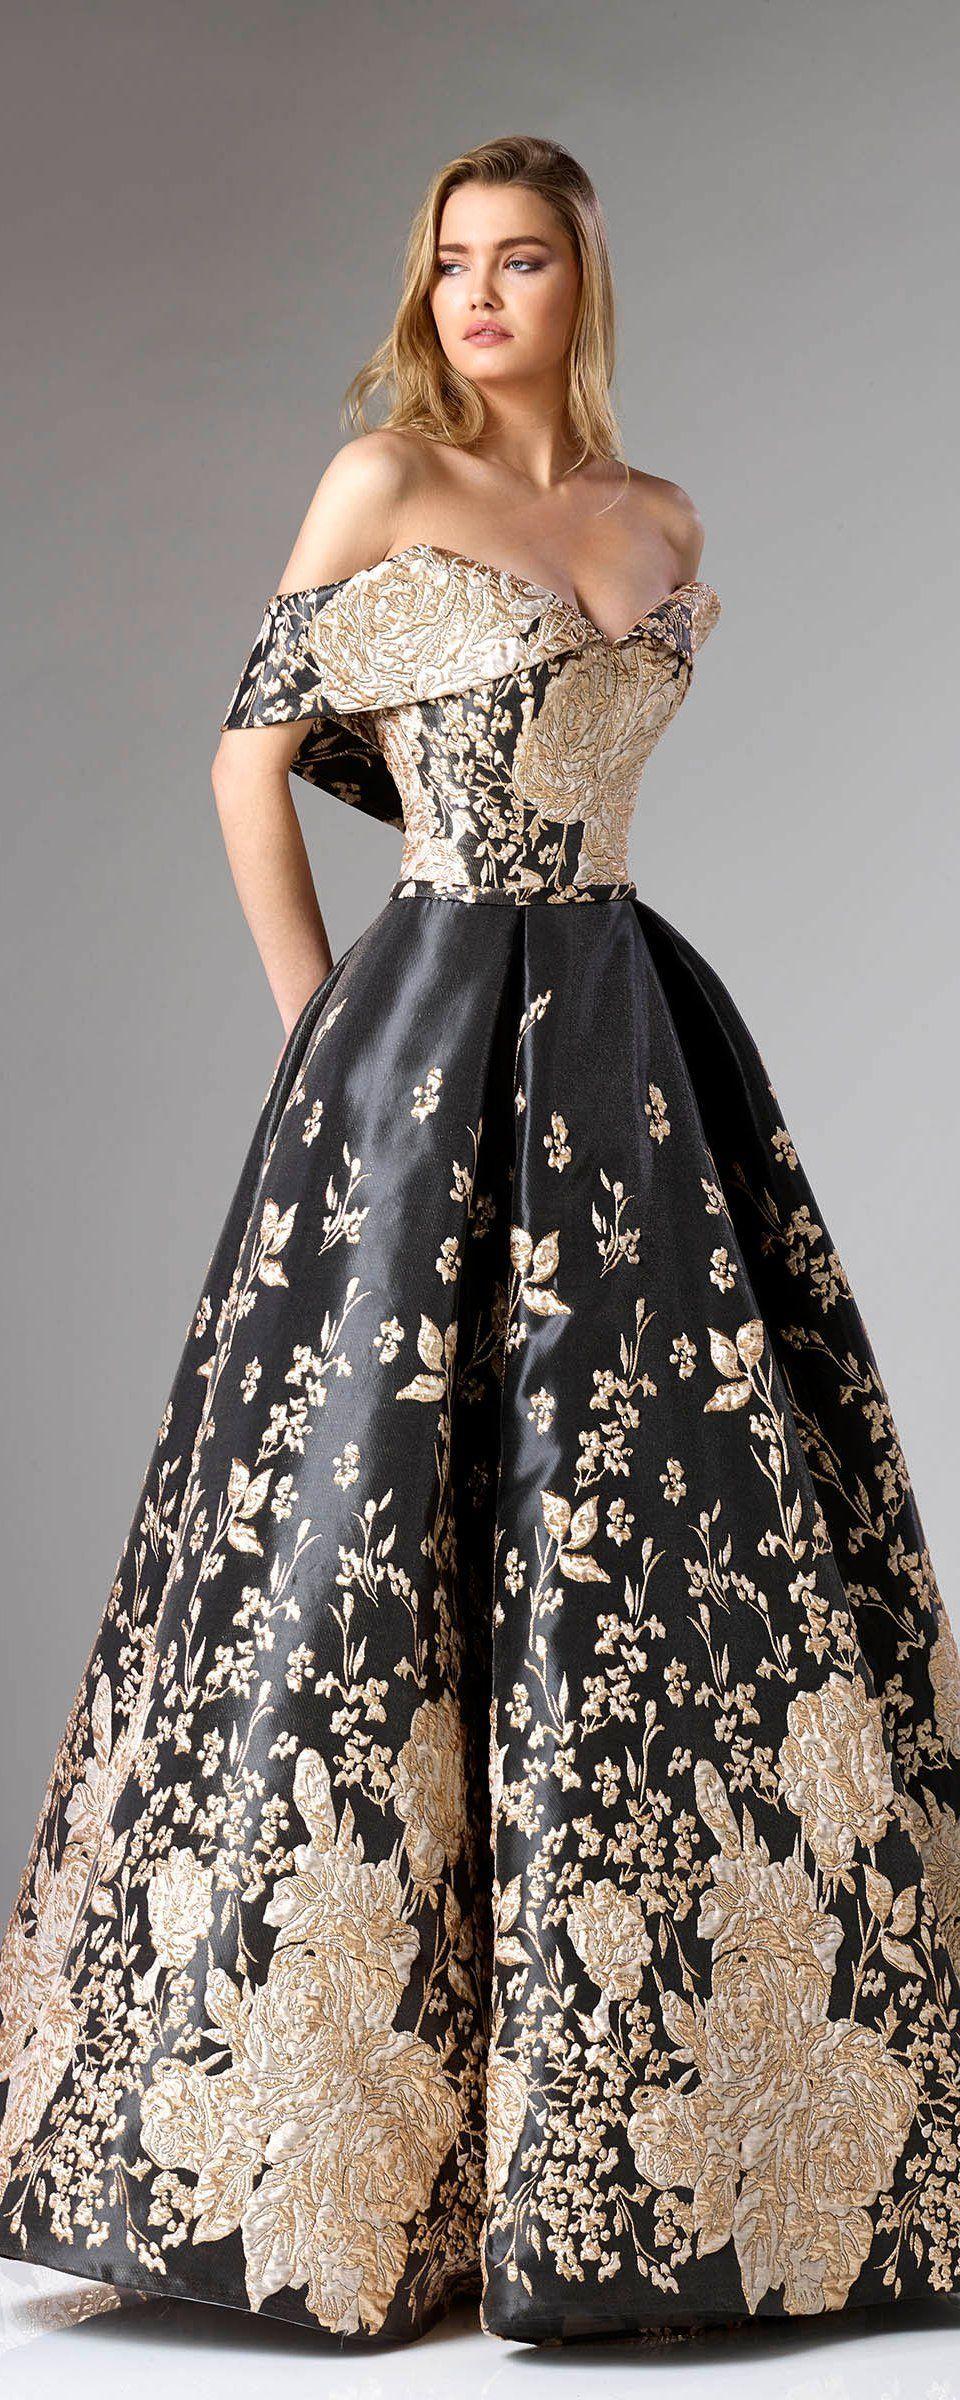 Edward arsouni haute couture frorientpalms